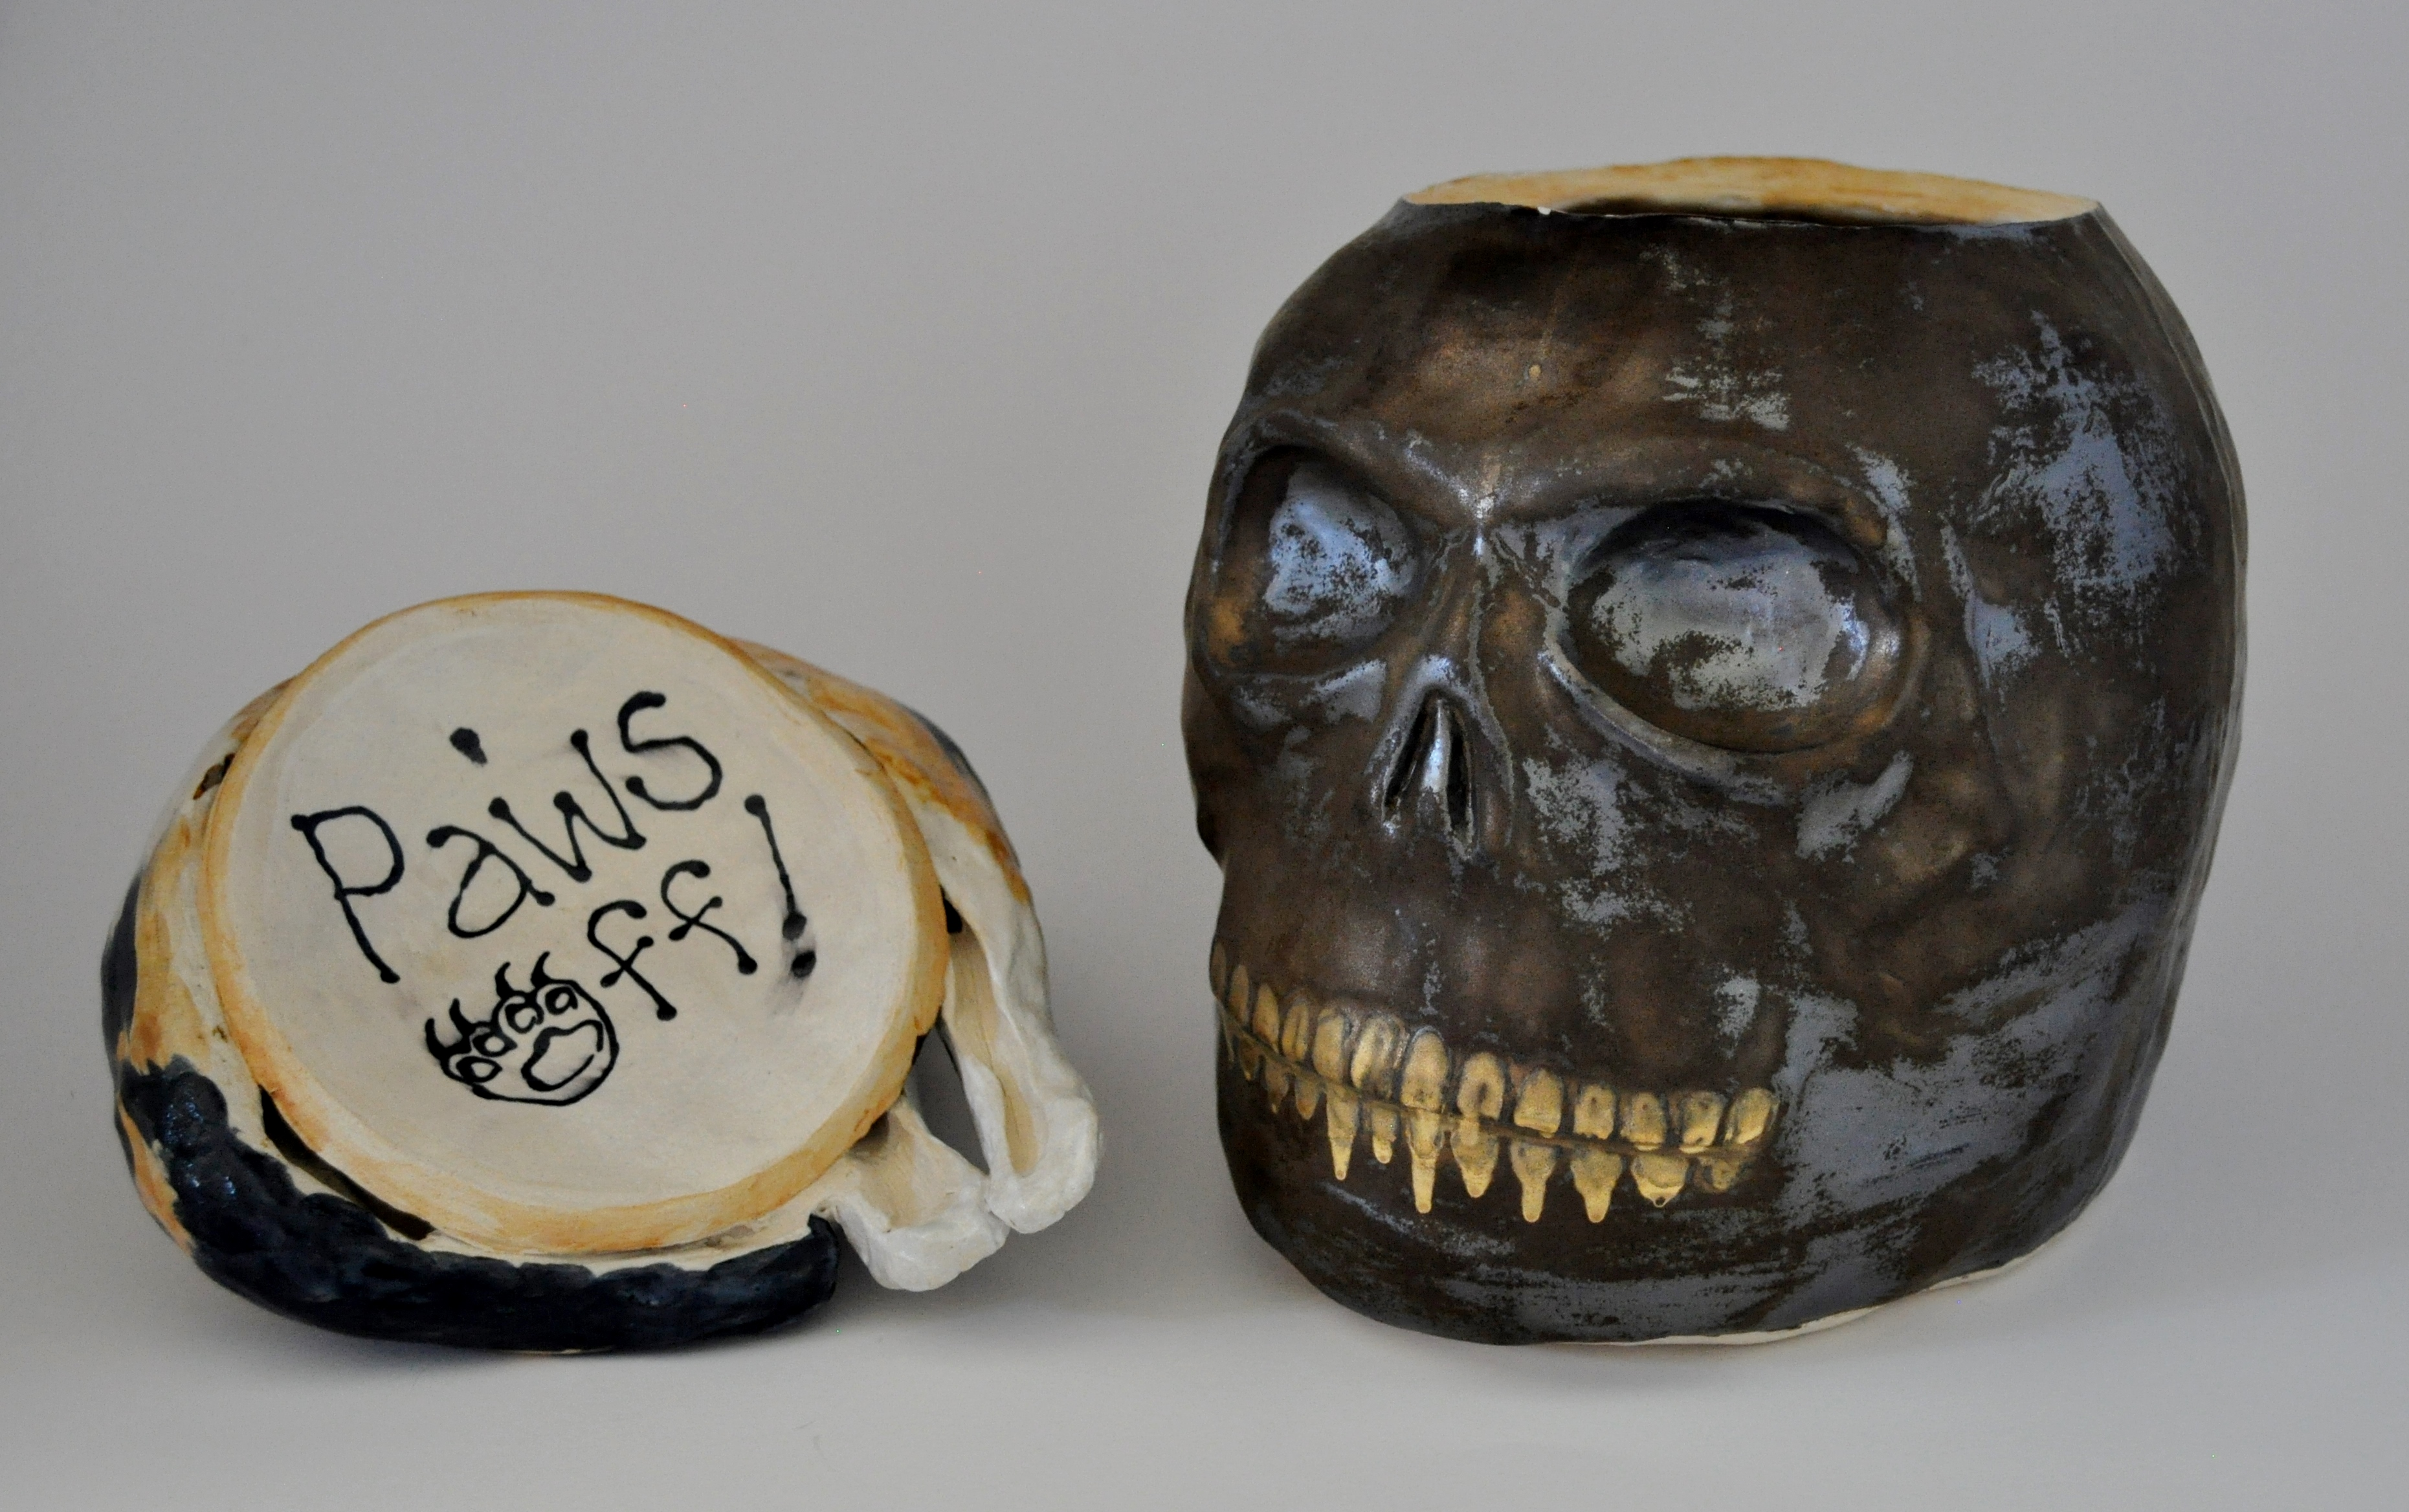 Pussy, Cat Skull-under lid view